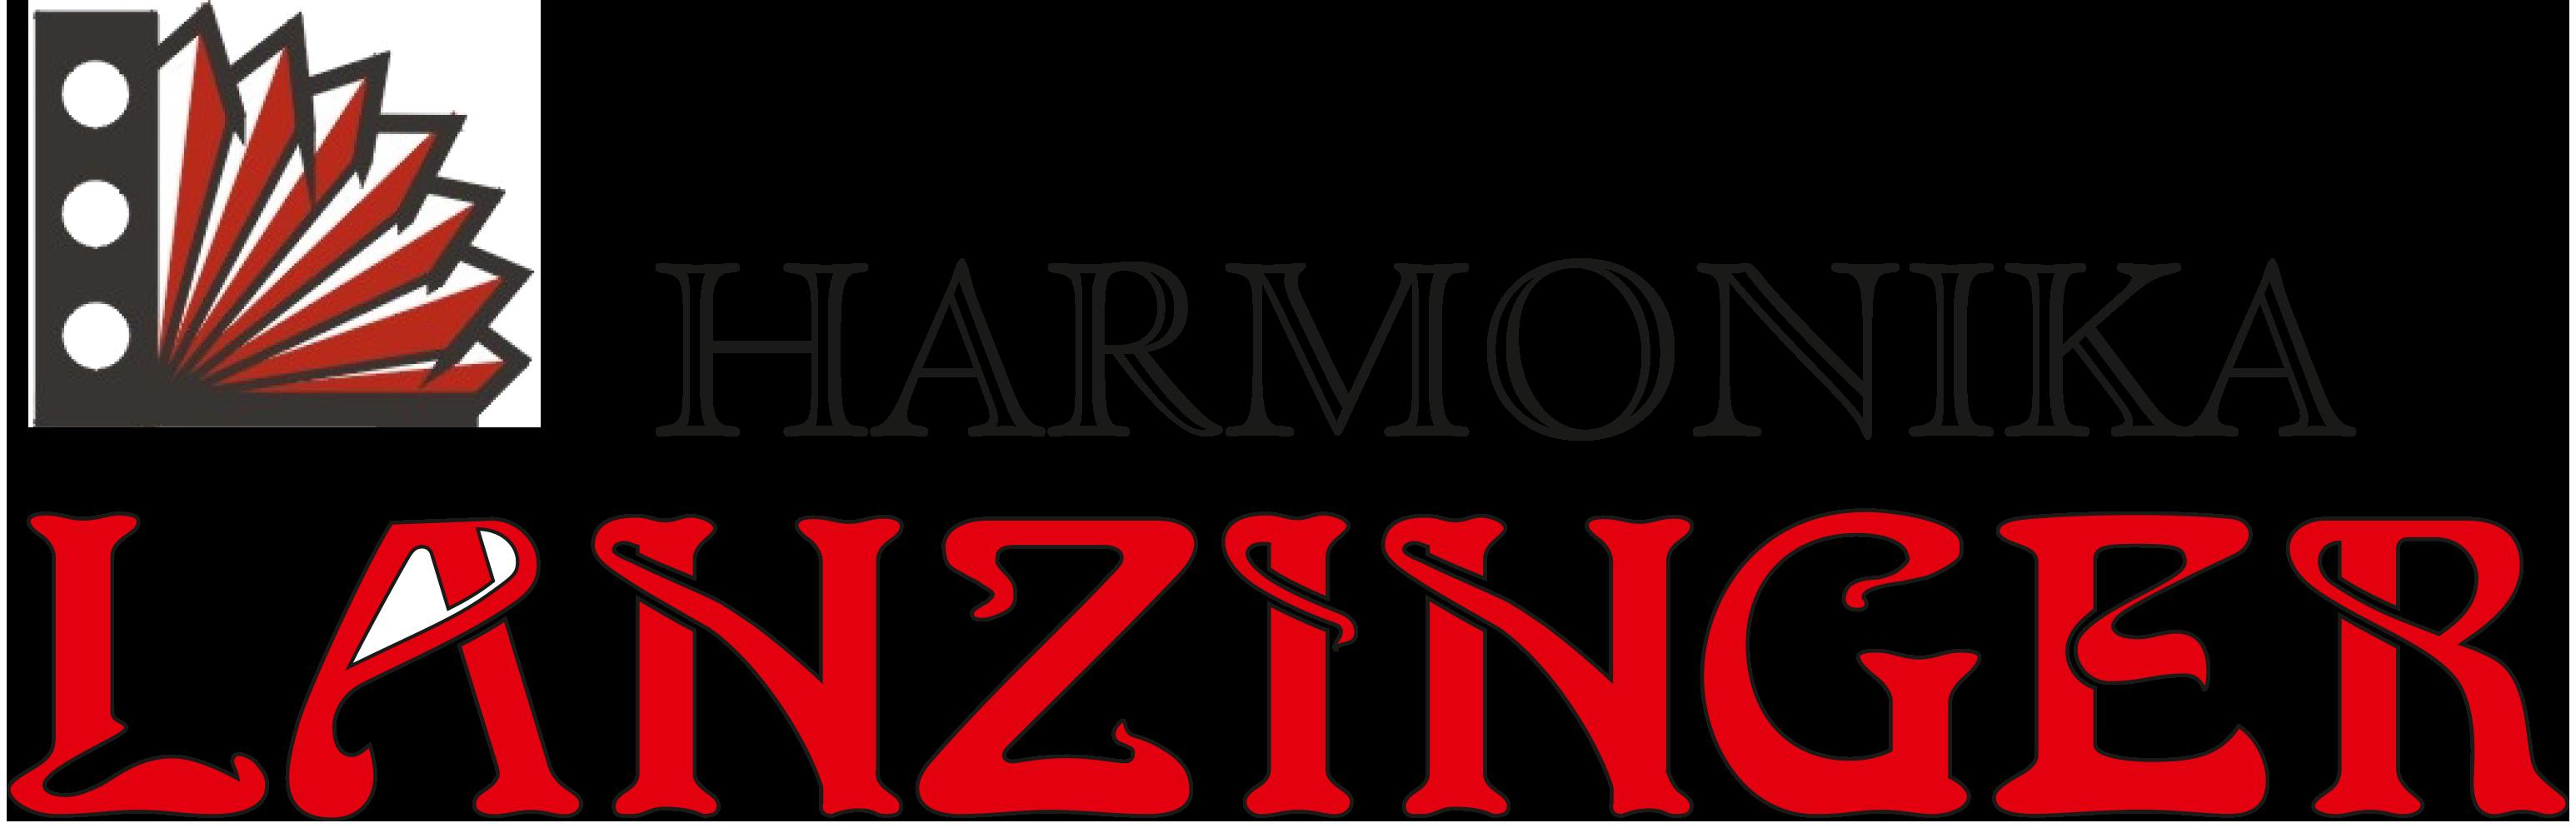 Lanzinger Harmonika